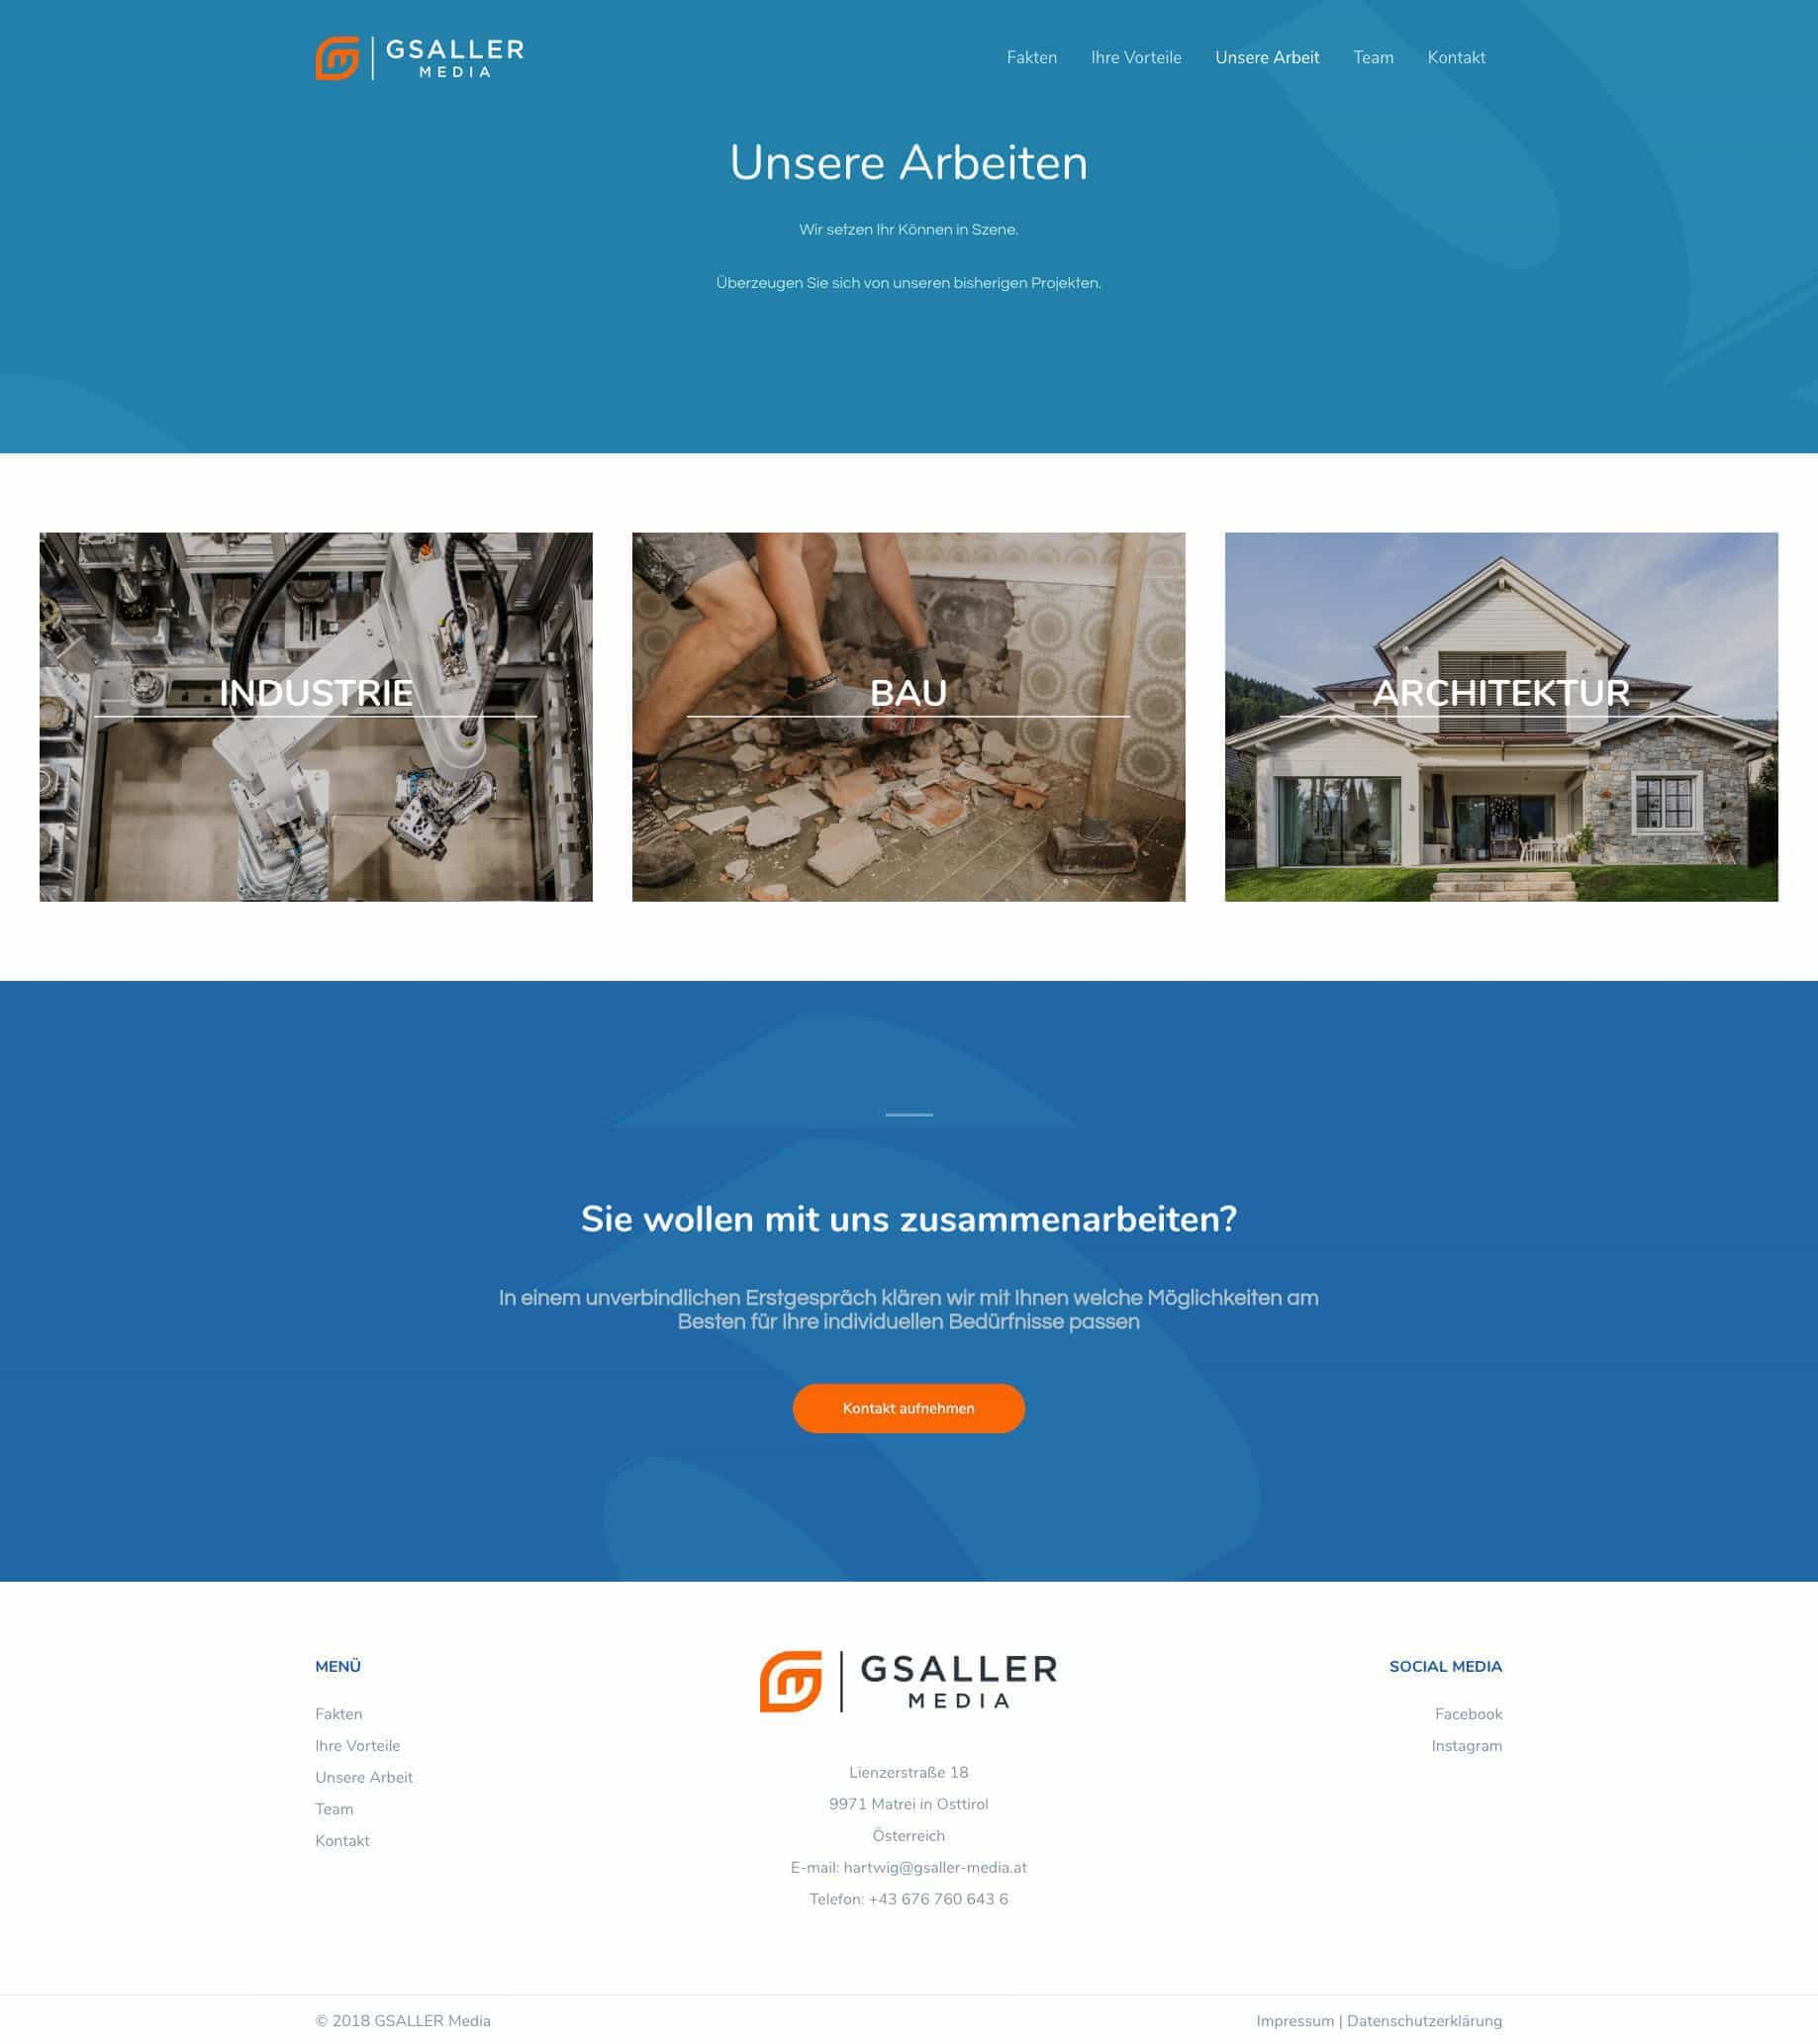 Gsaller Media Webdesign Agentur Seite Portfolio